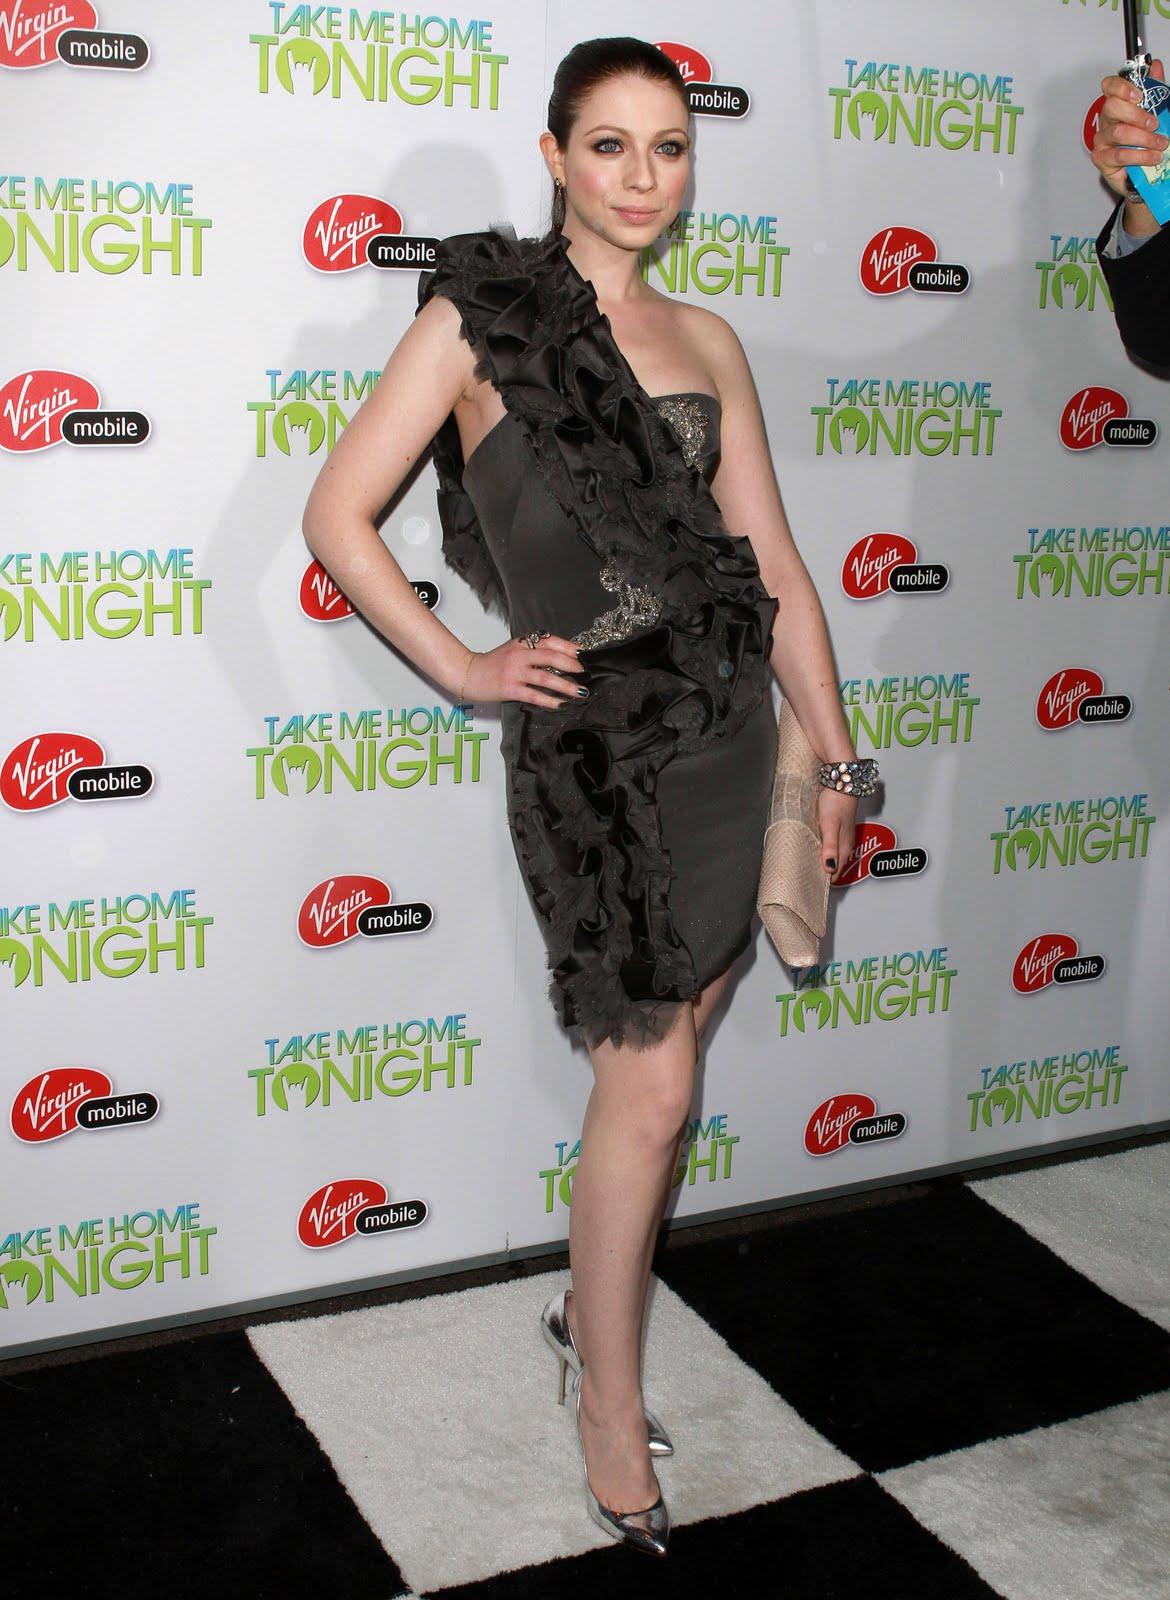 http://3.bp.blogspot.com/-6rgFGWTY9rQ/TbnpXT_-BgI/AAAAAAAAHfM/Qxs-E8vUbSA/s1600/Michelle_Trachtenberg_Take_Me_Home_Tonight_Premiere_J0001_030.jpg